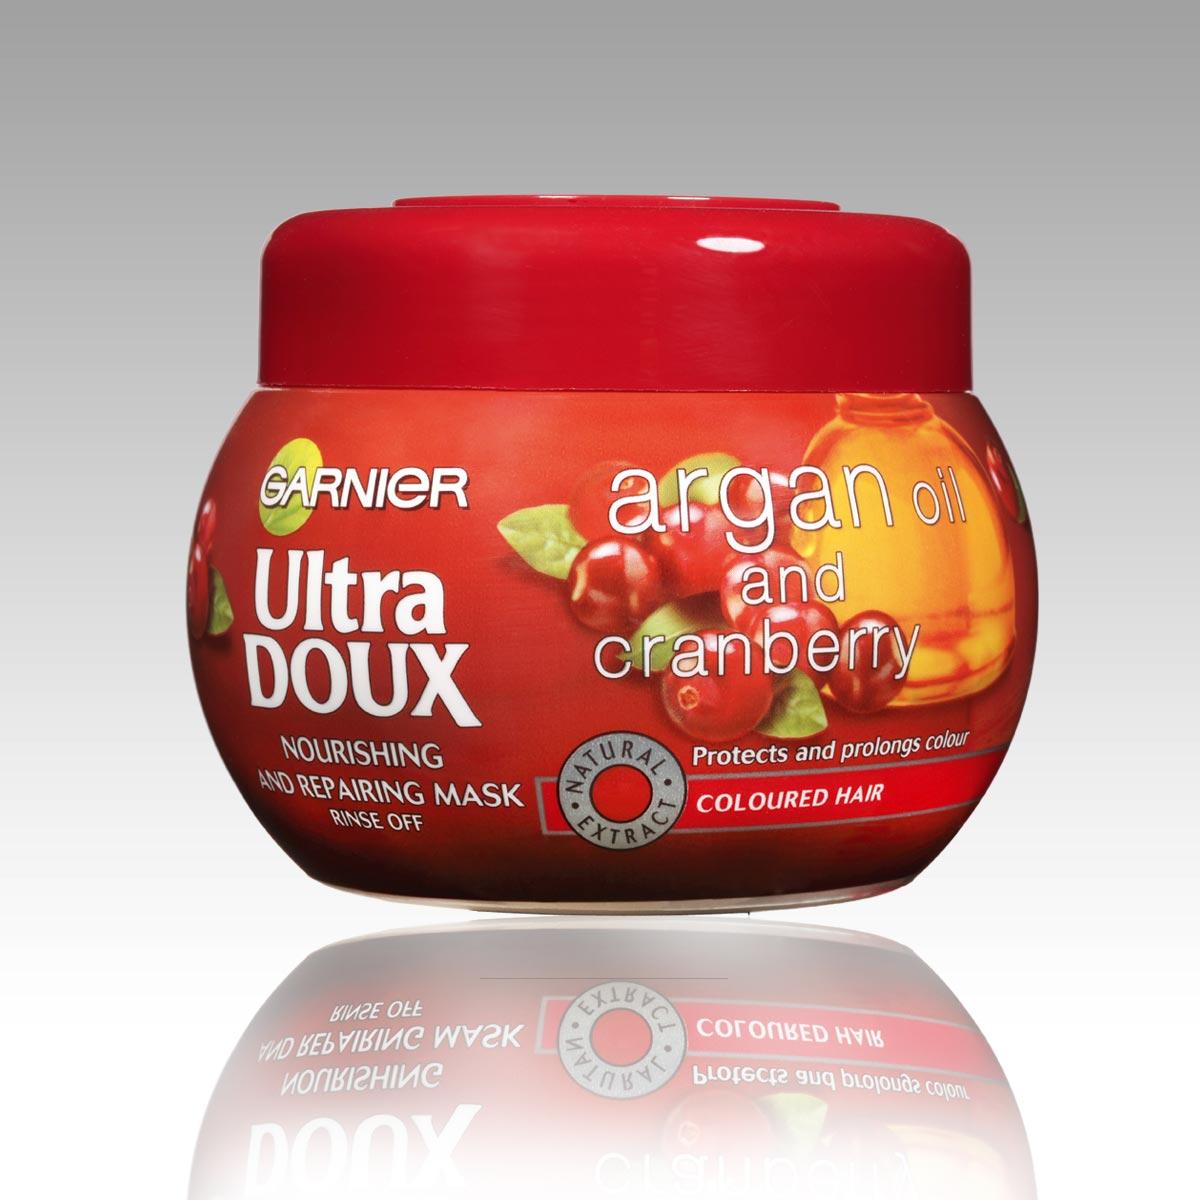 Masky na vlasy Garnier Ultra Doux: maska na vlasy Ultra Doux Arganový olej a brusinka.